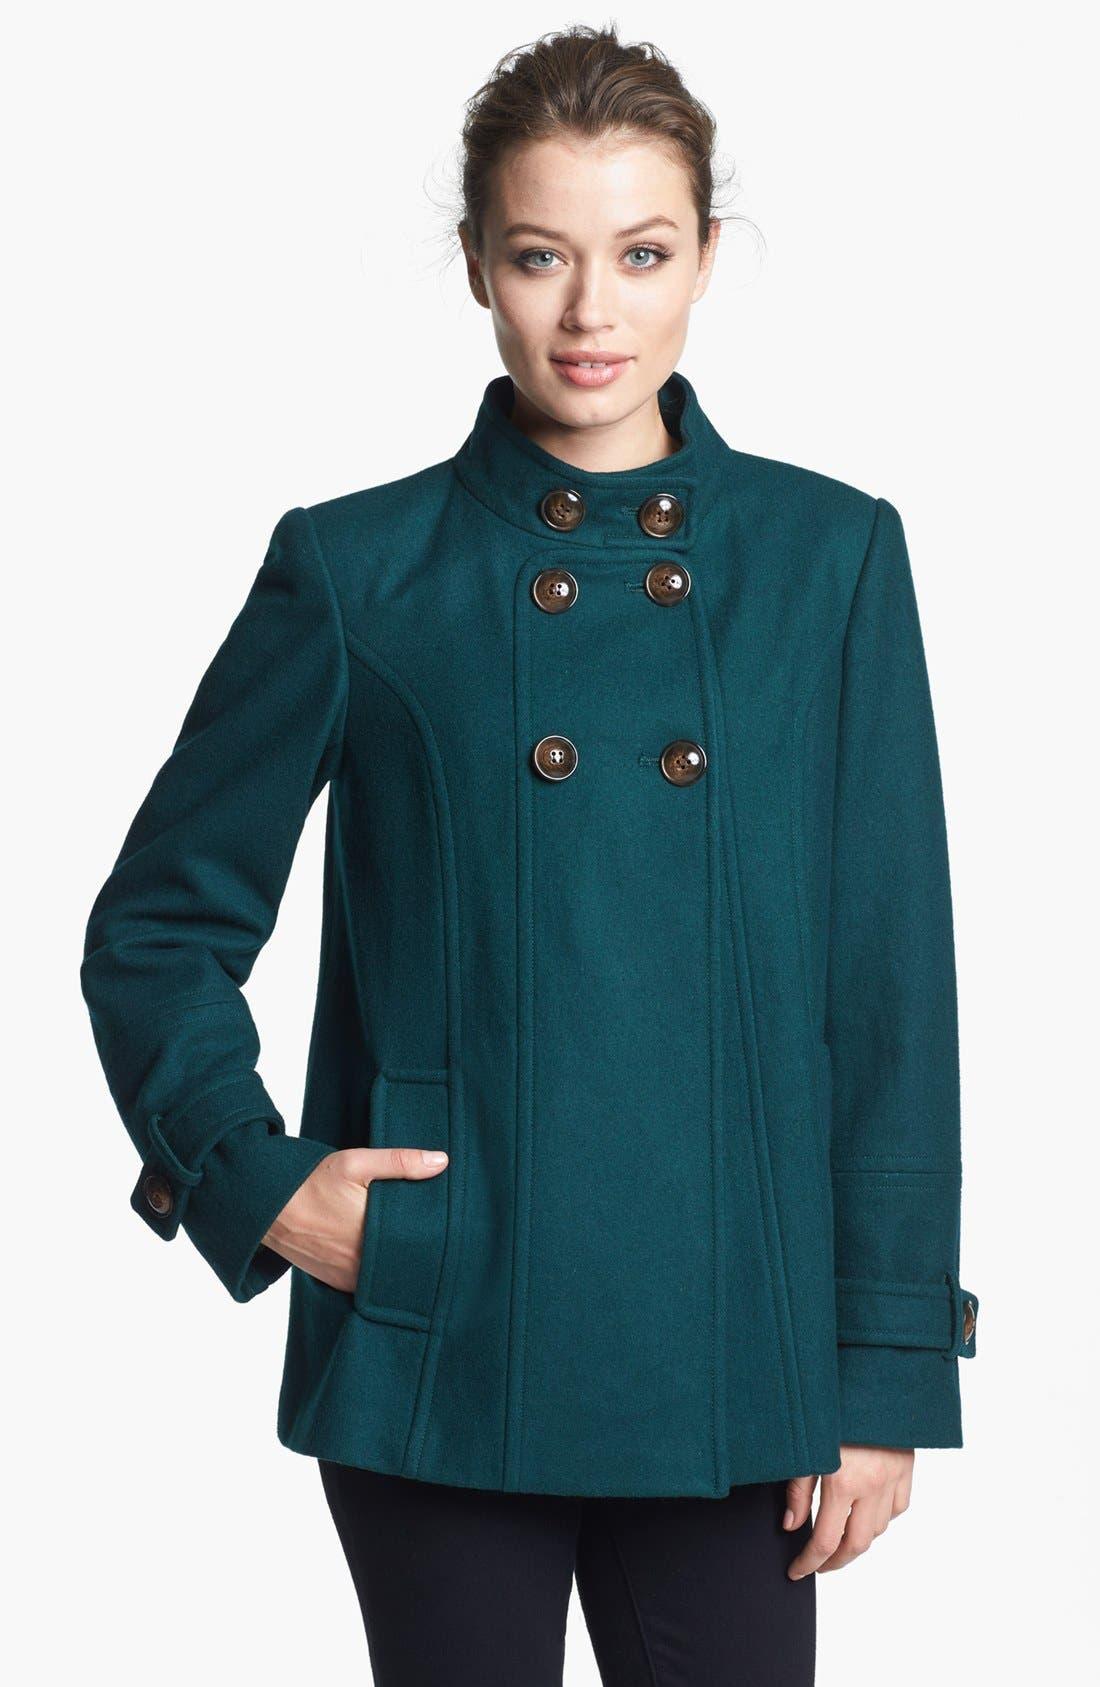 Alternate Image 1 Selected - Gallery Double Breasted Wool Blend Jacket (Petite)